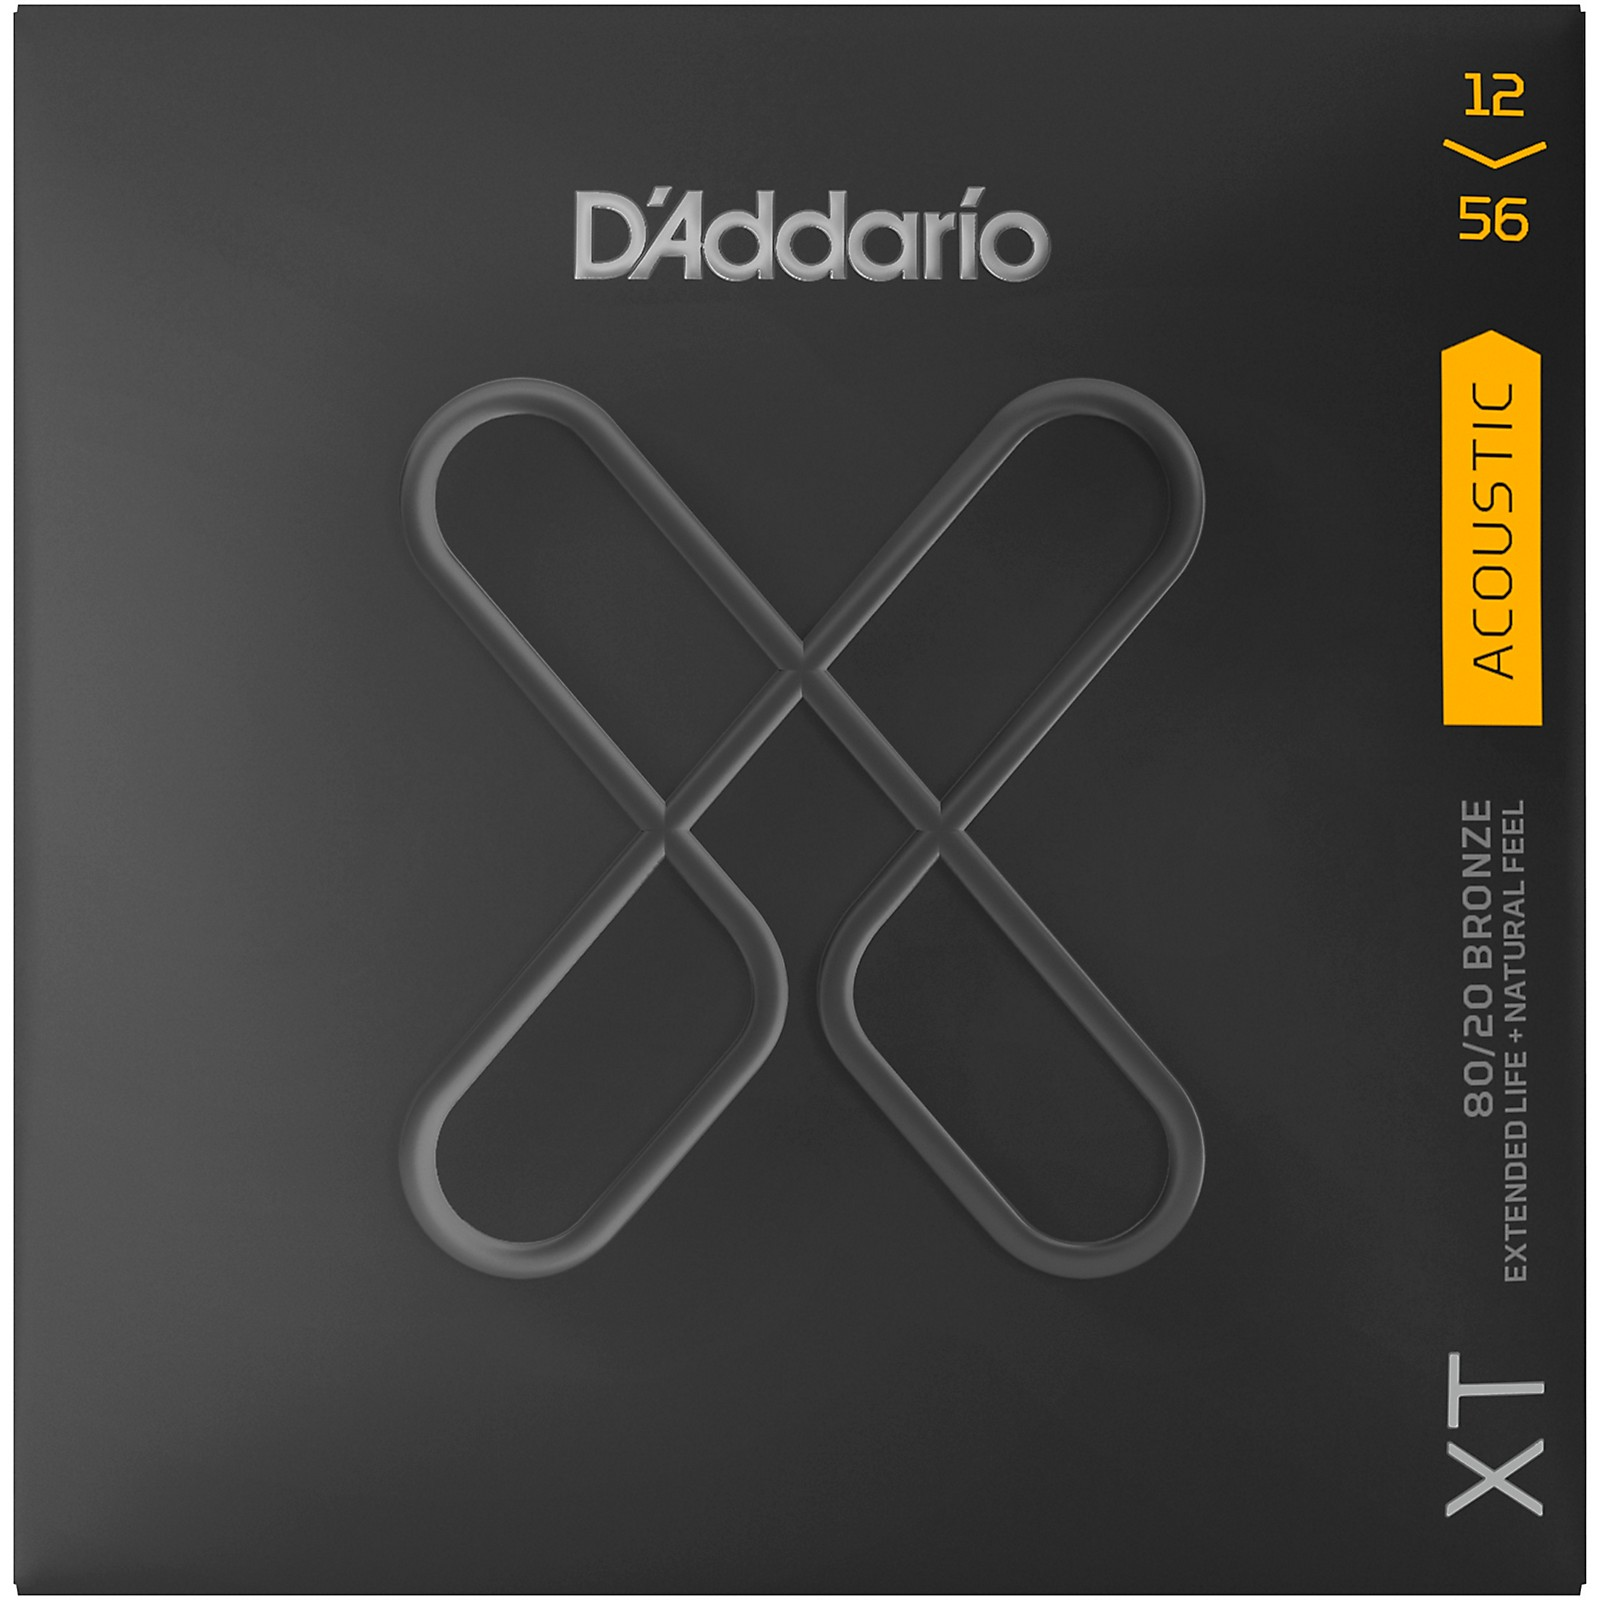 D'Addario XT Acoustic 80/20 Bronze Strings, 12-56